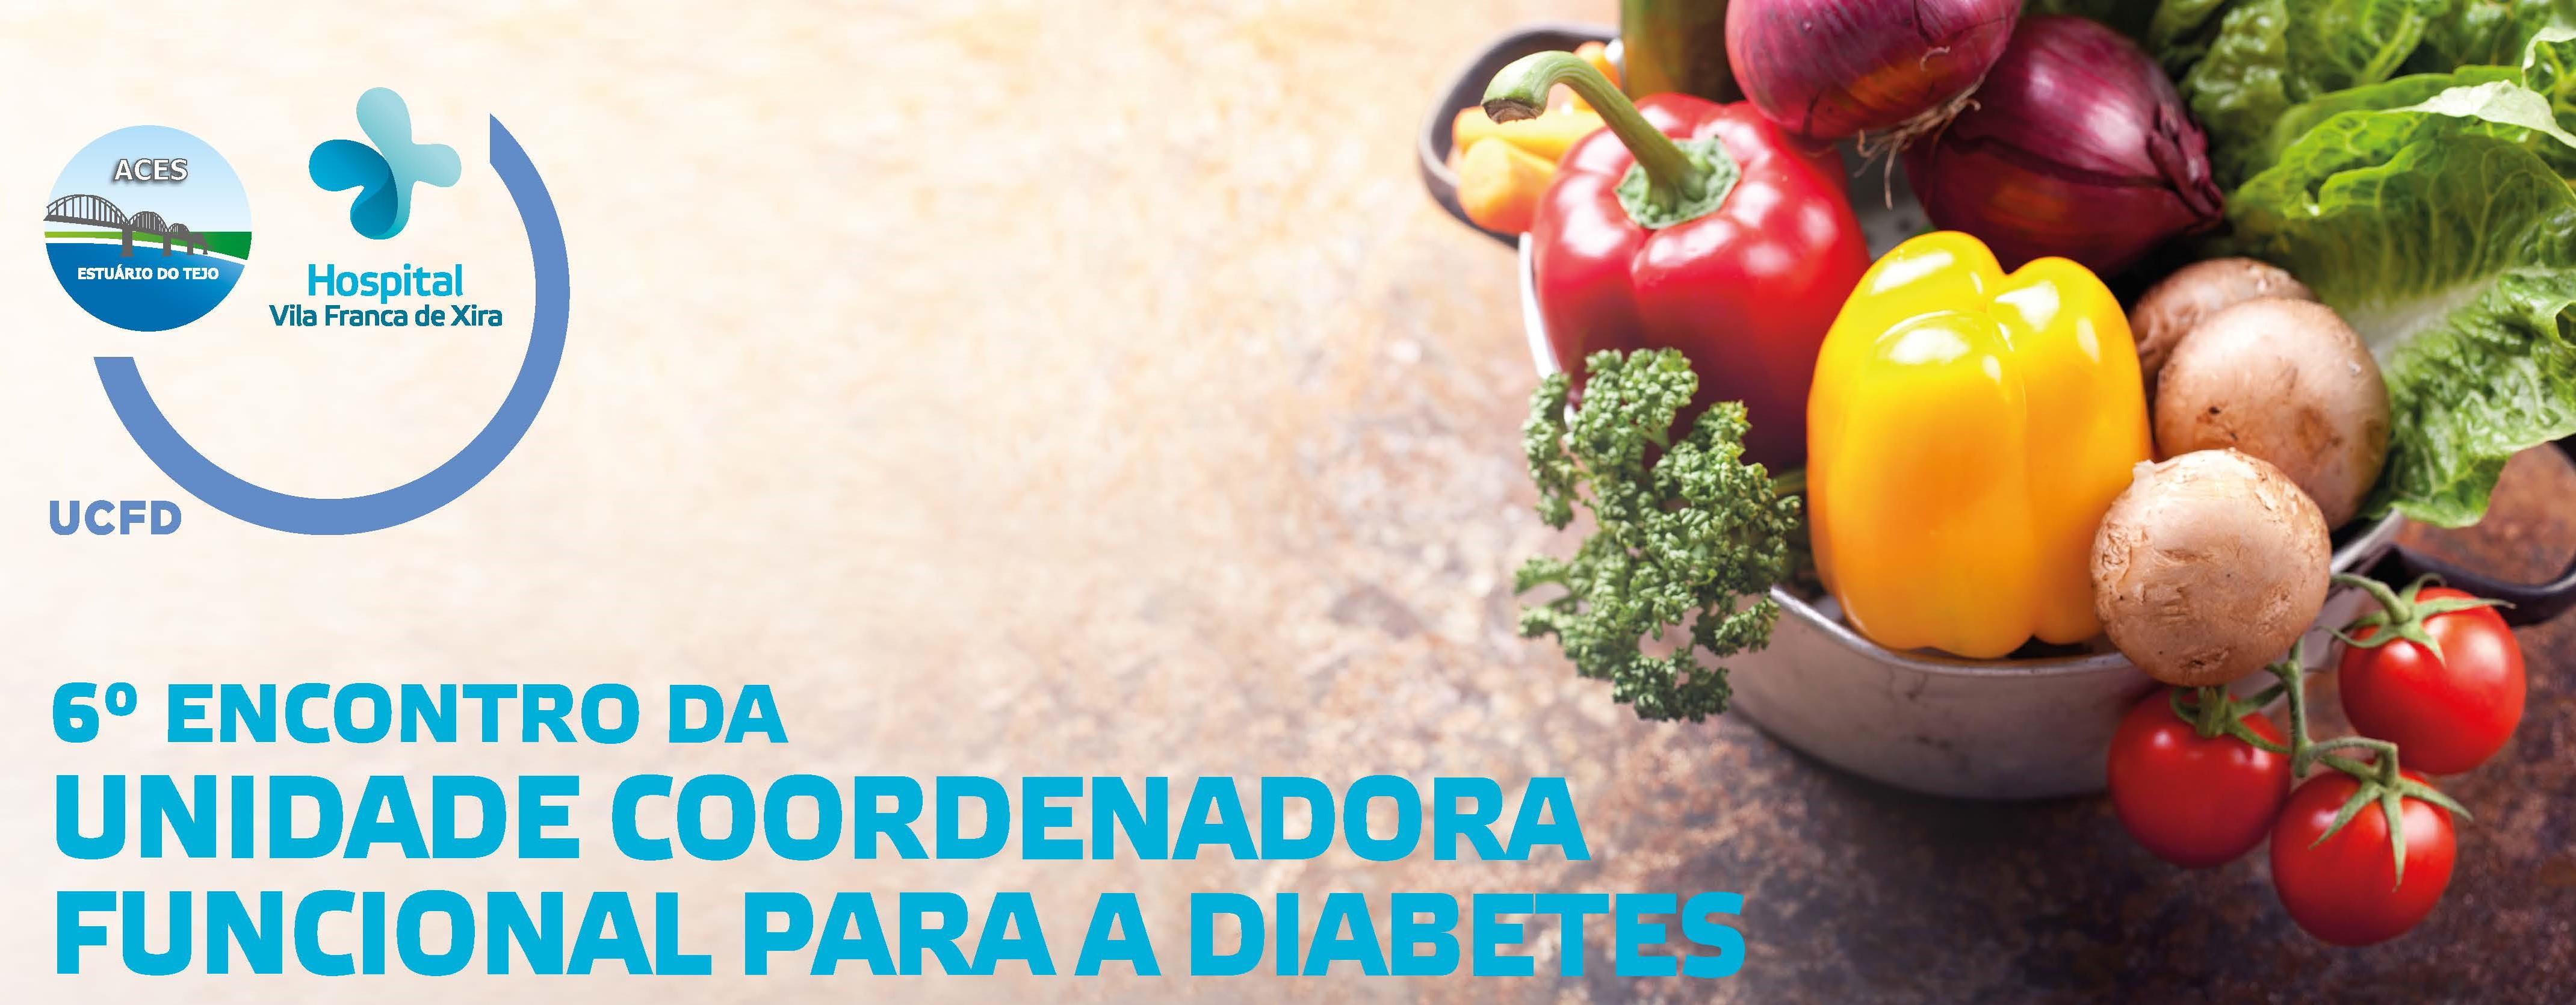 hospital-de-vila-franca-de-xira-6º Encontro da Unidade Coordenadora Funcional para a Diabetes